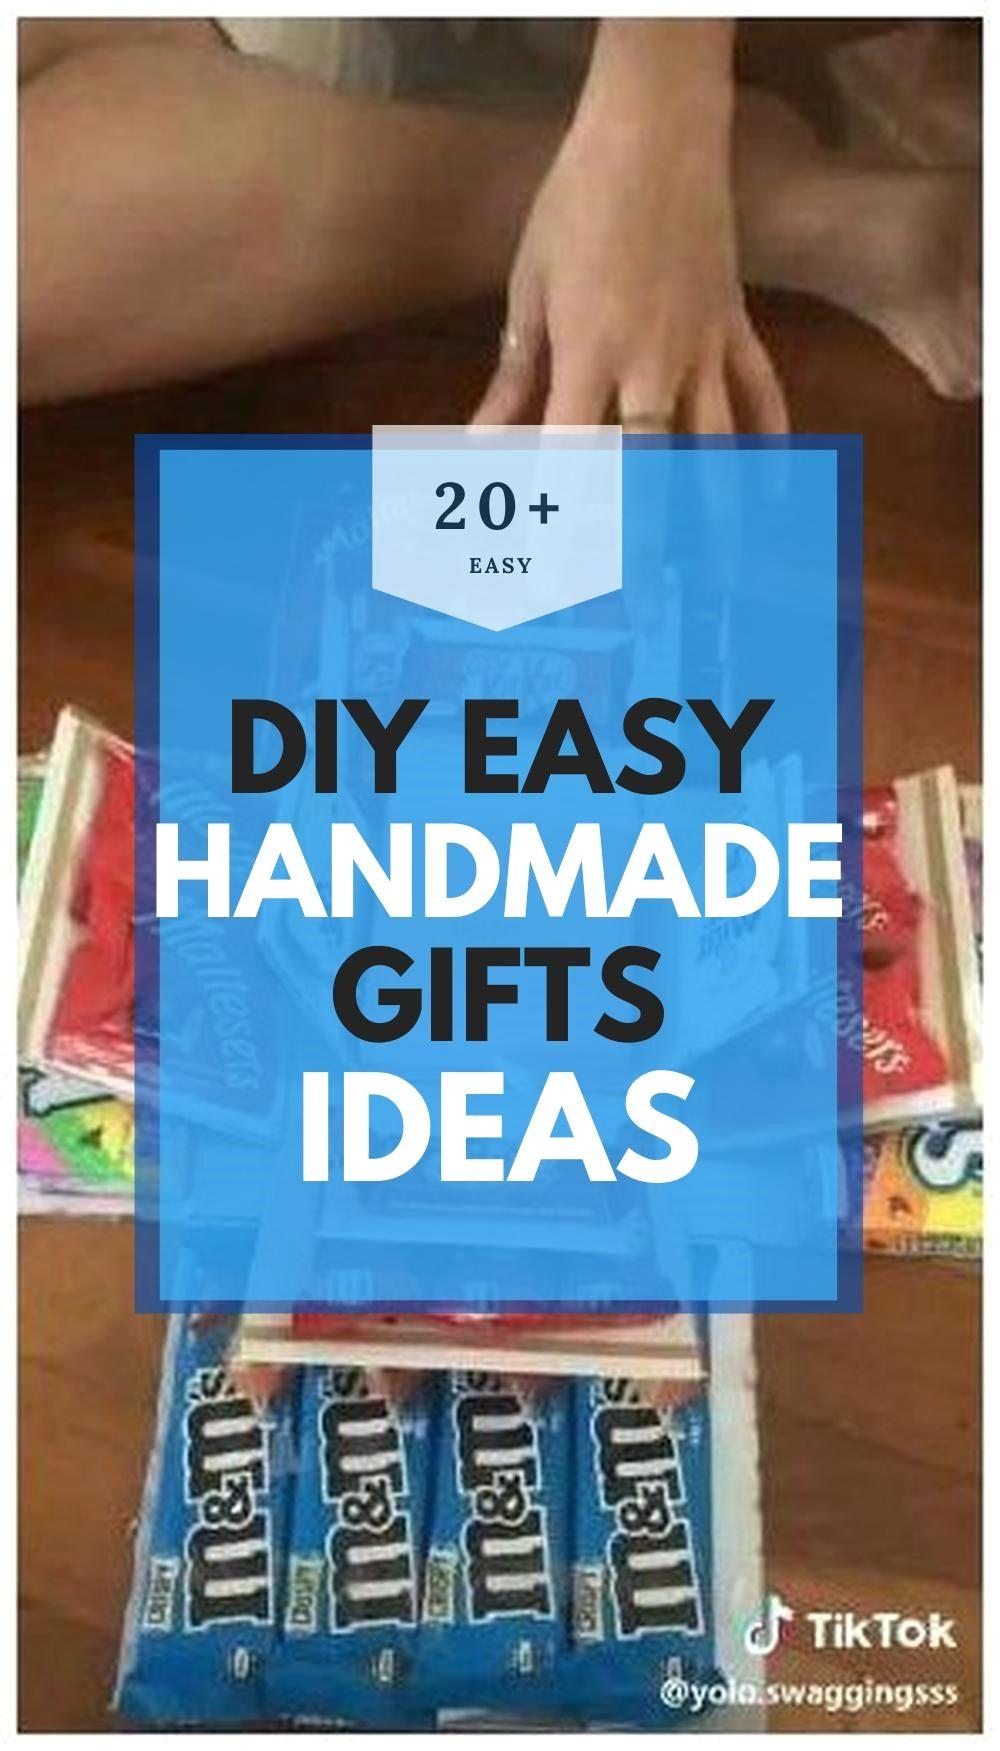 Creative Handmade Gifts Diys In 2021 Diy Gifts Cheap Easy Diy Gifts Diy Gift